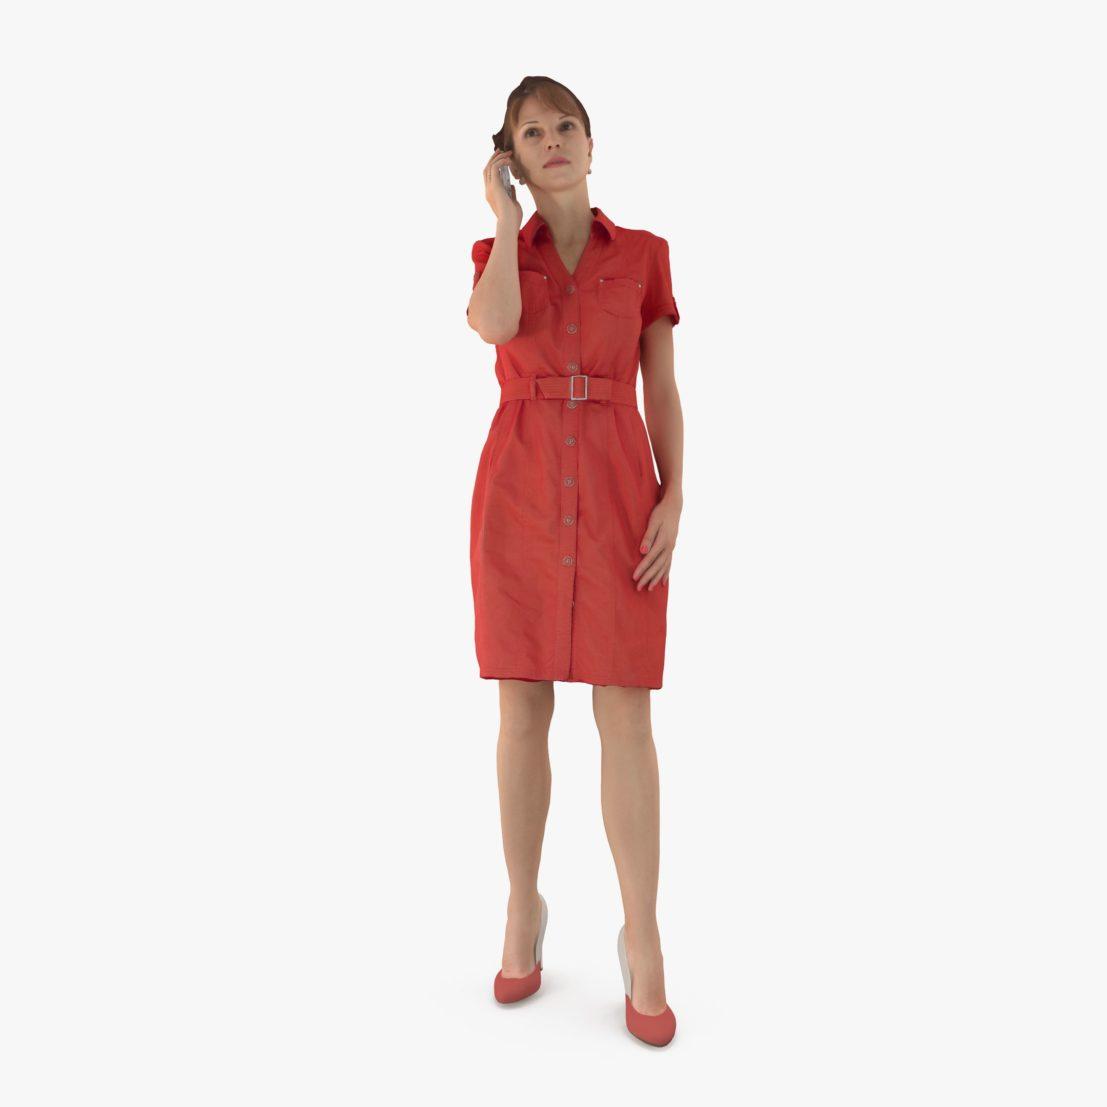 Lady in Red Dress 3D Model | 3DTree Scanning Studio